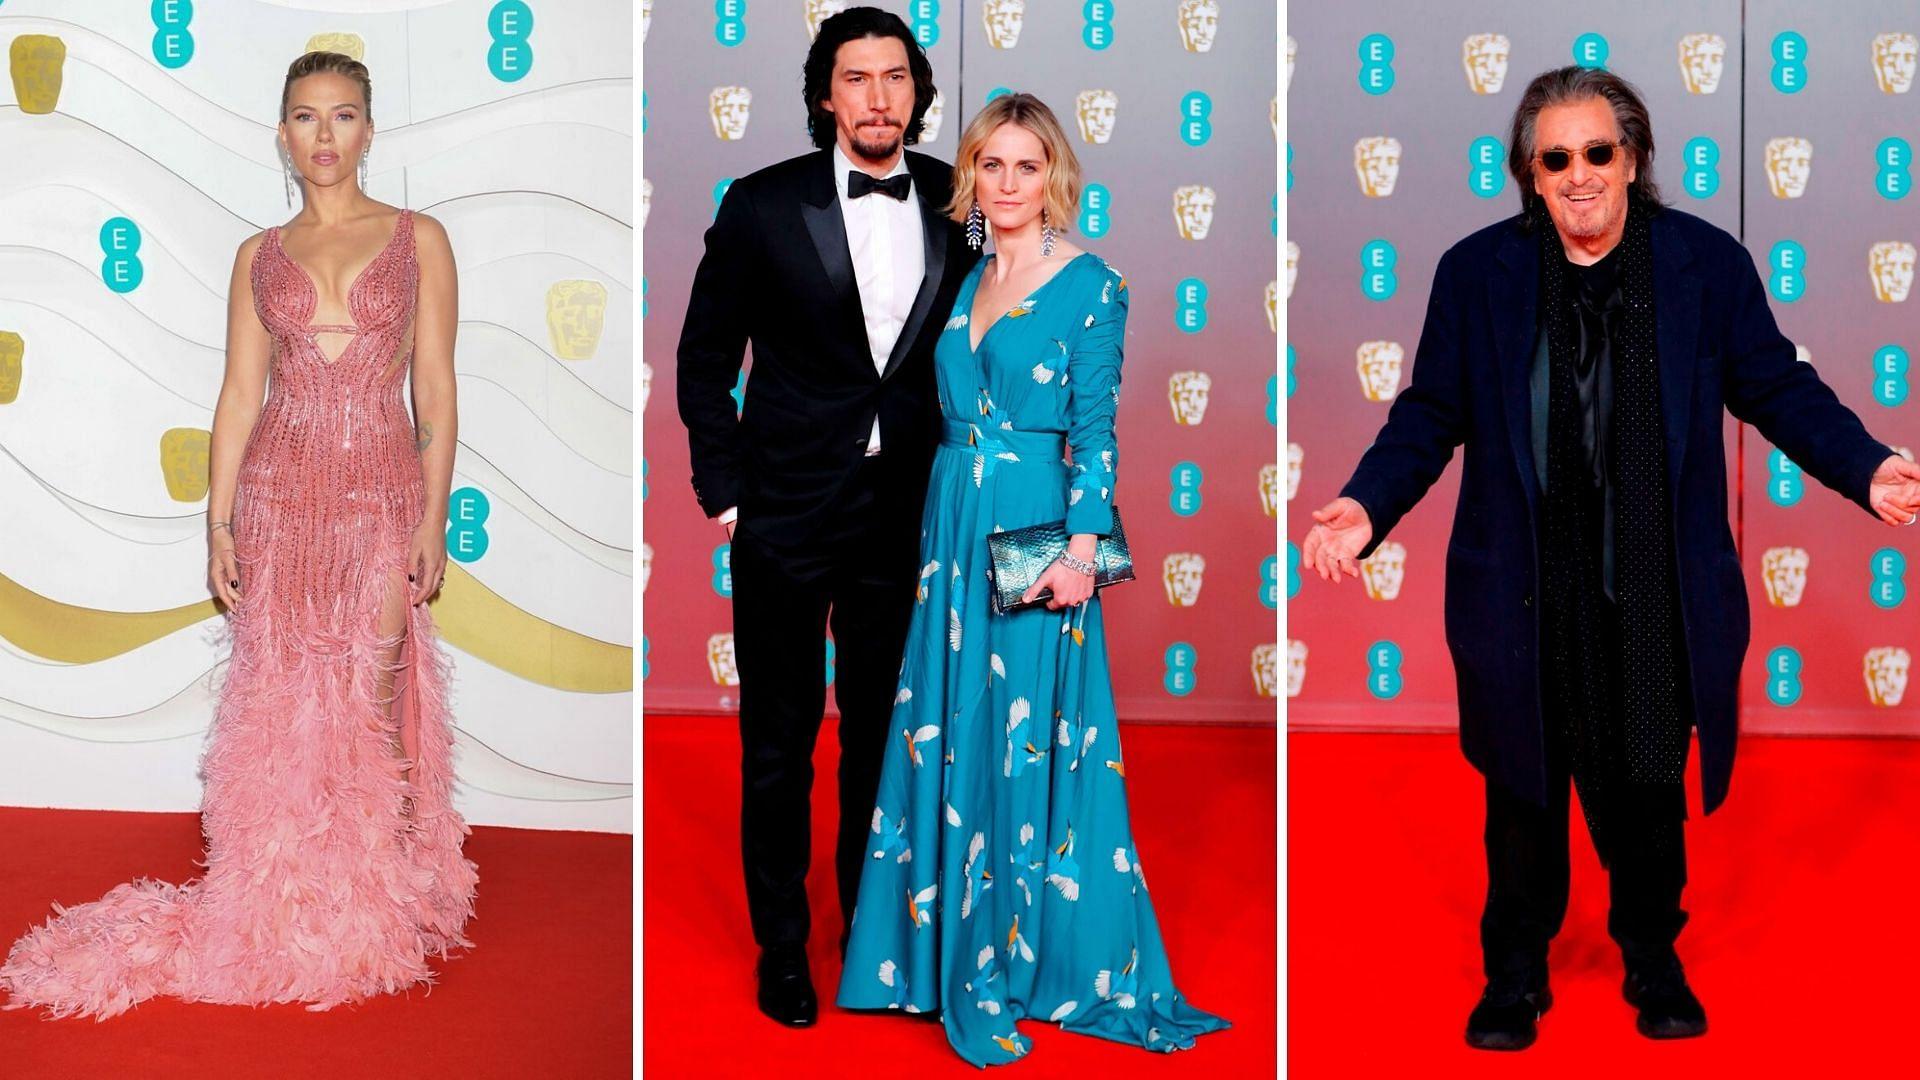 Al Pacino, Scarlett Johansson & Others at BAFTAs 2020 Red Carpet